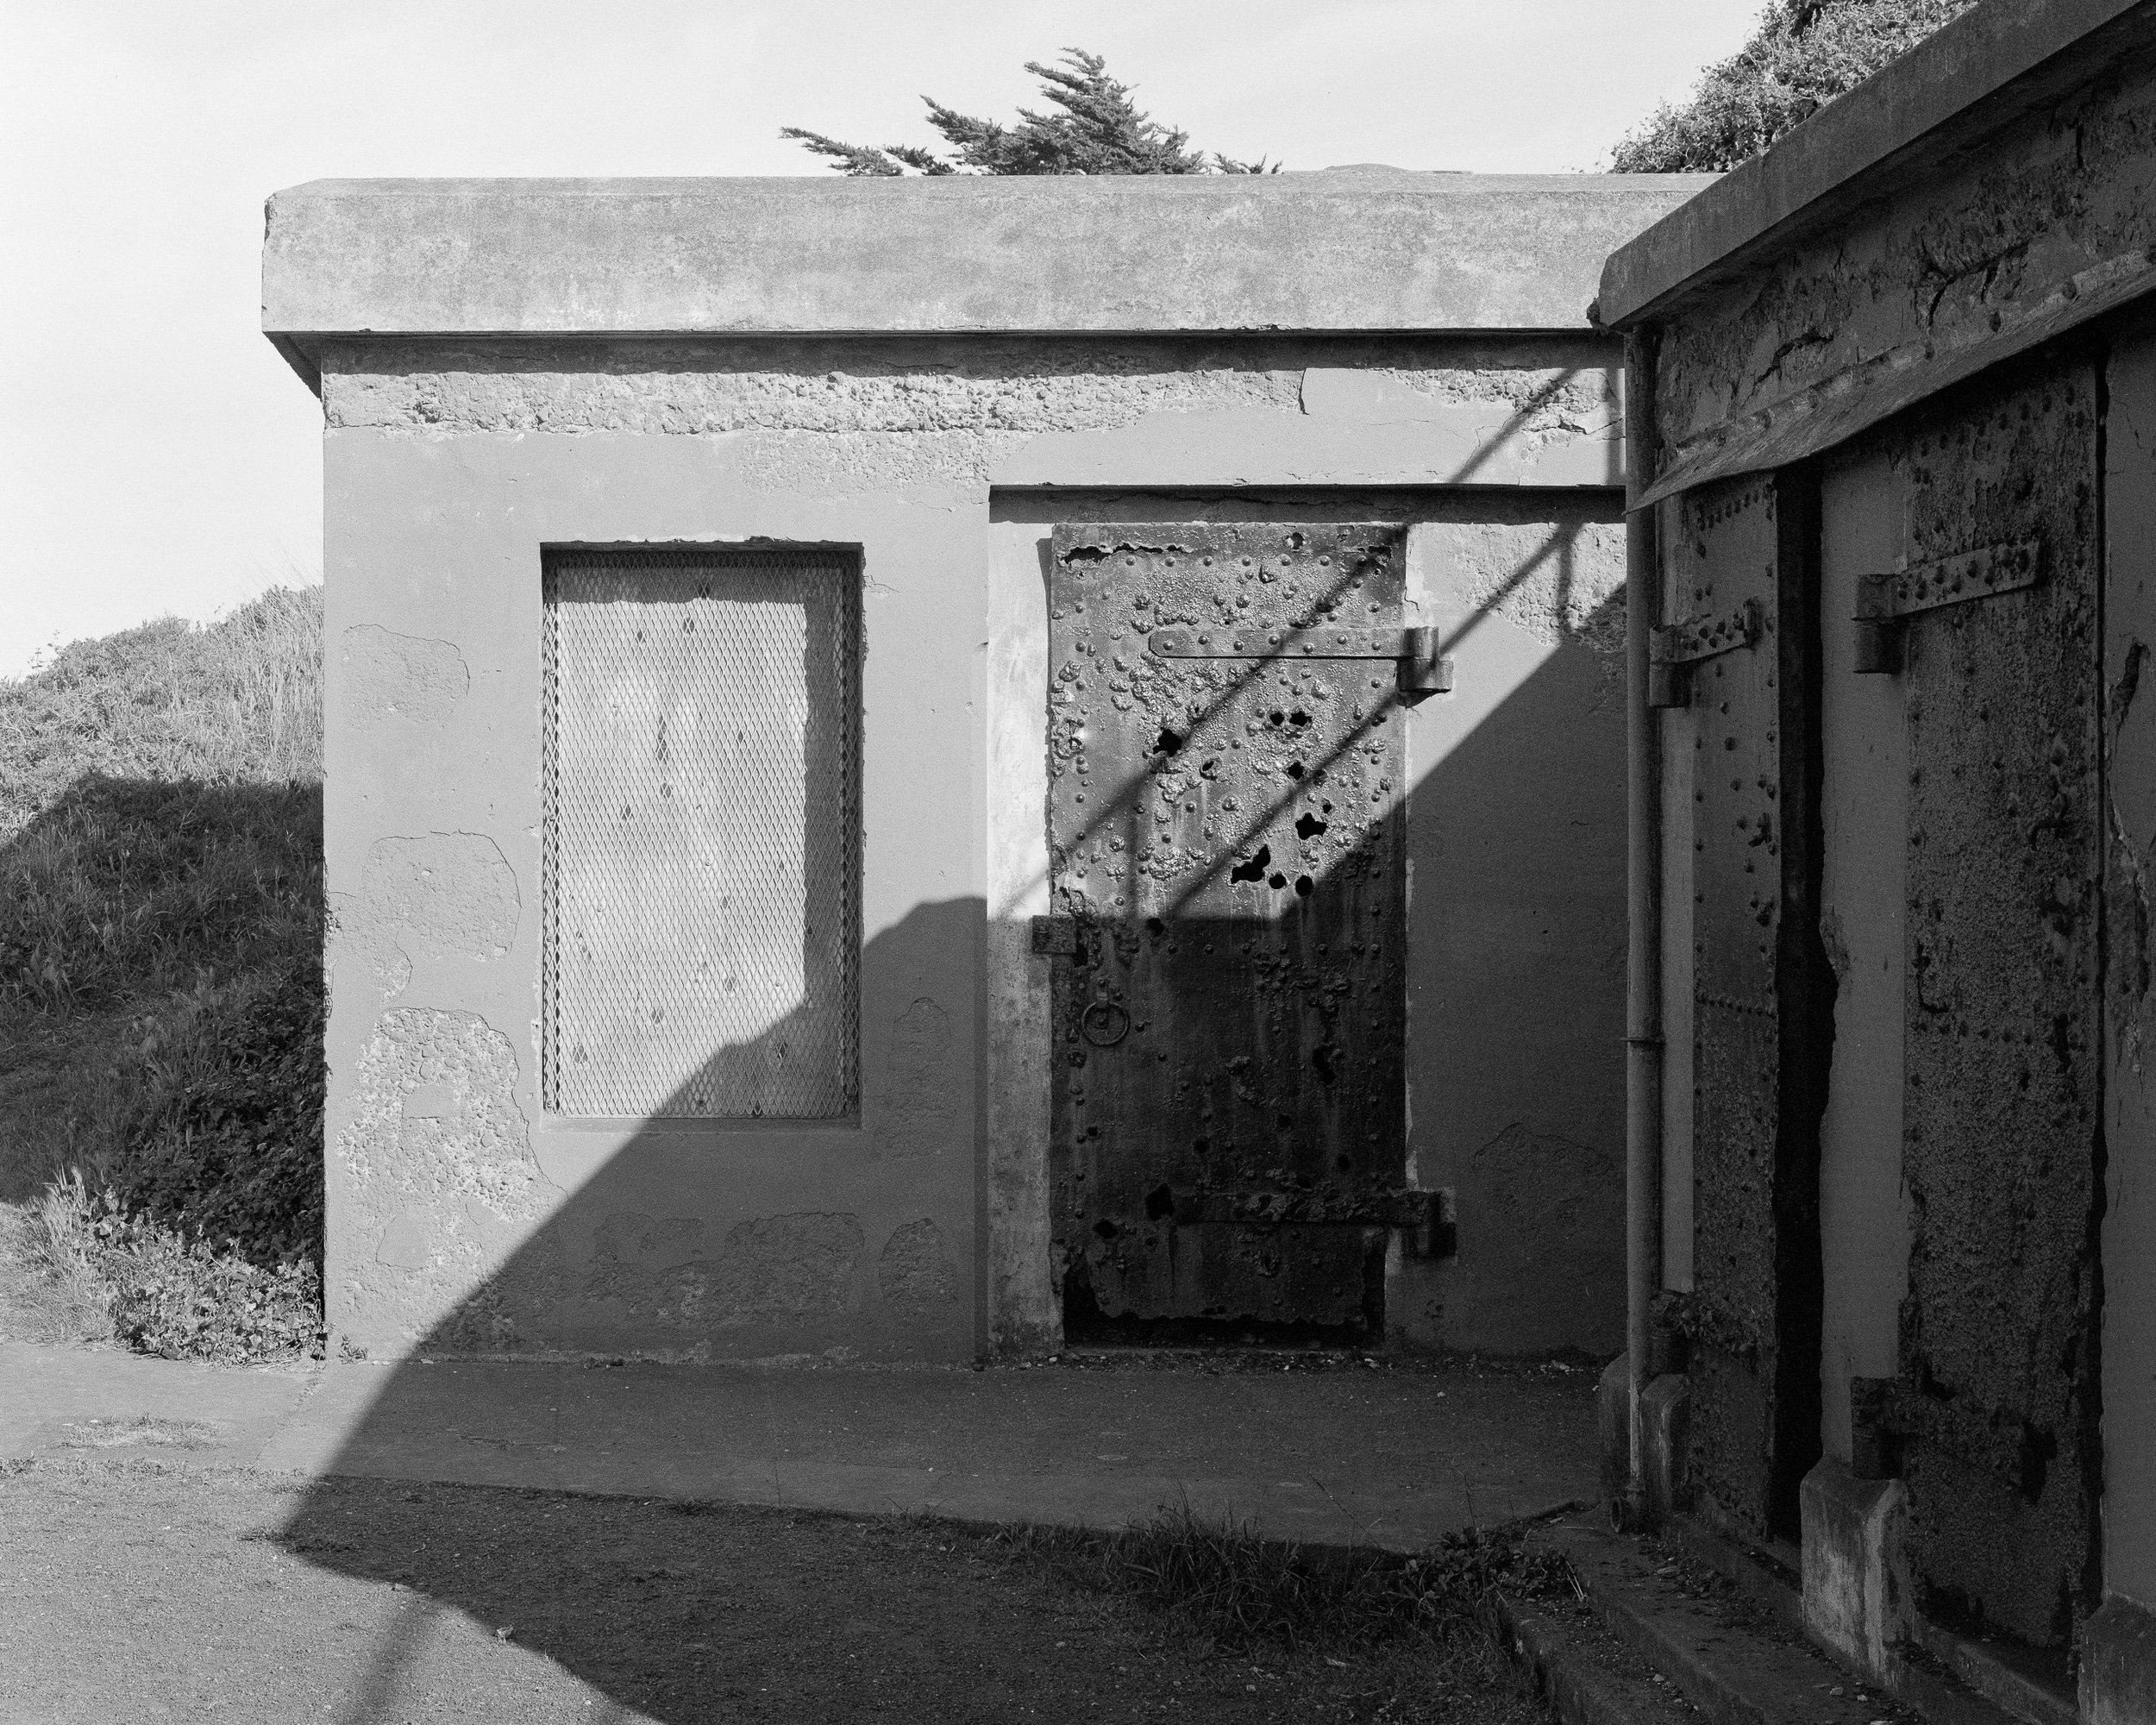 20180501 Marin Headlands 3 Doors Down.jpg